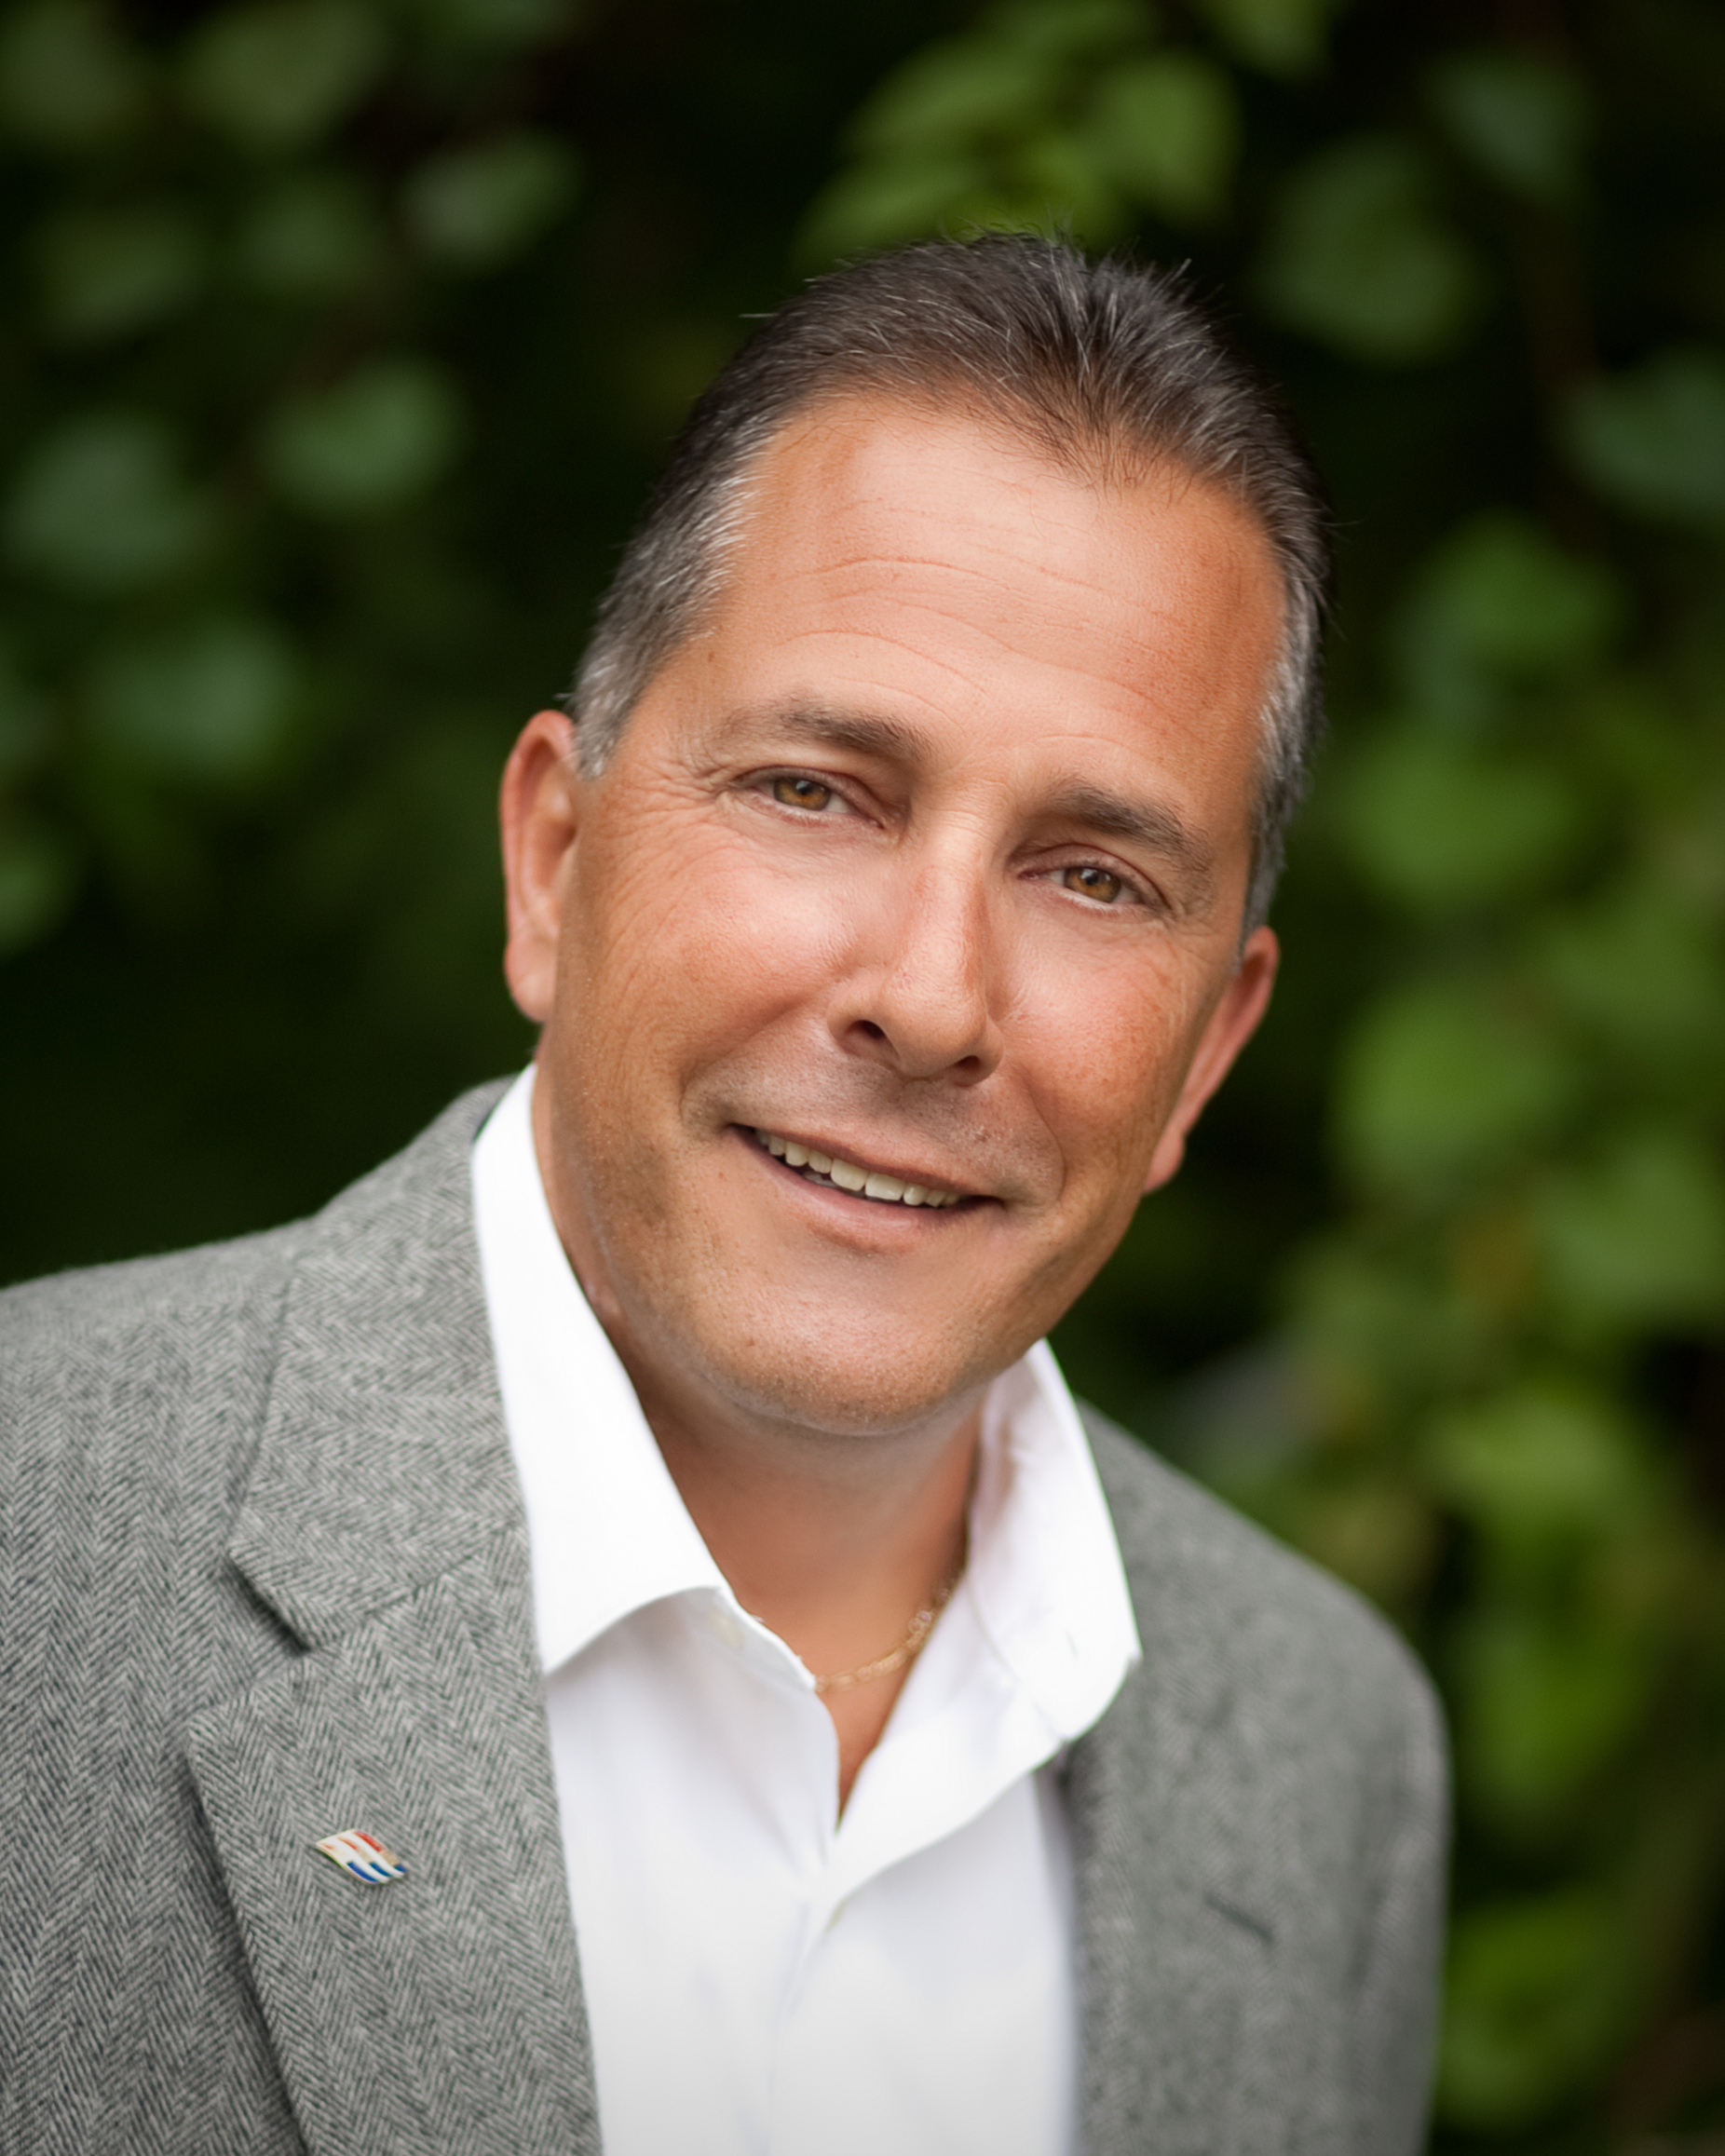 Mark Casel